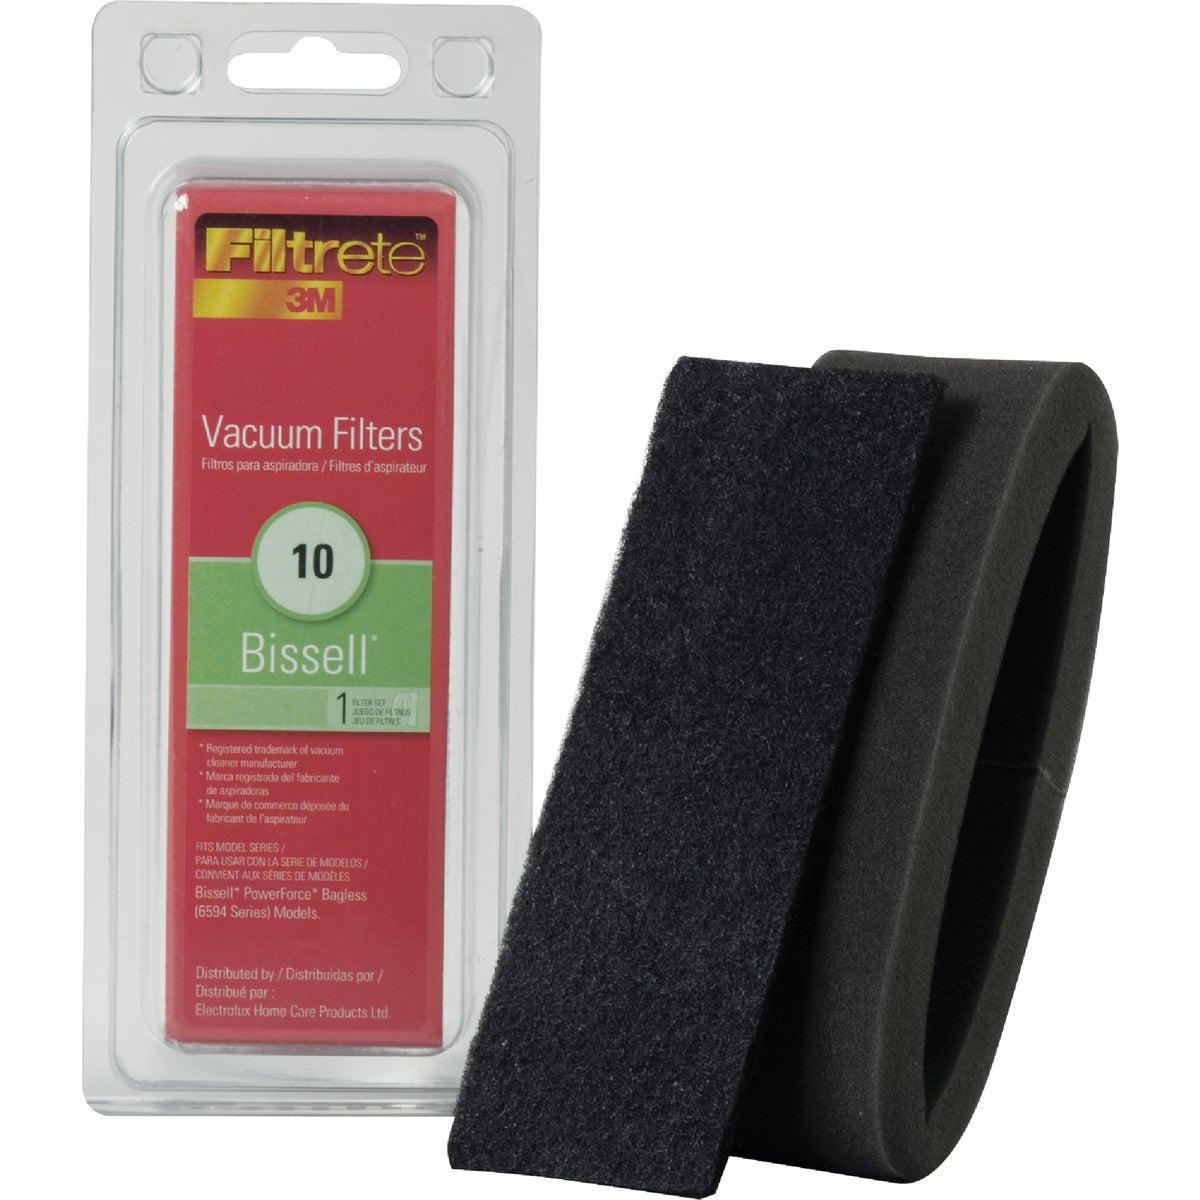 3M Filtrete Bissell 10 Vacuum Filter